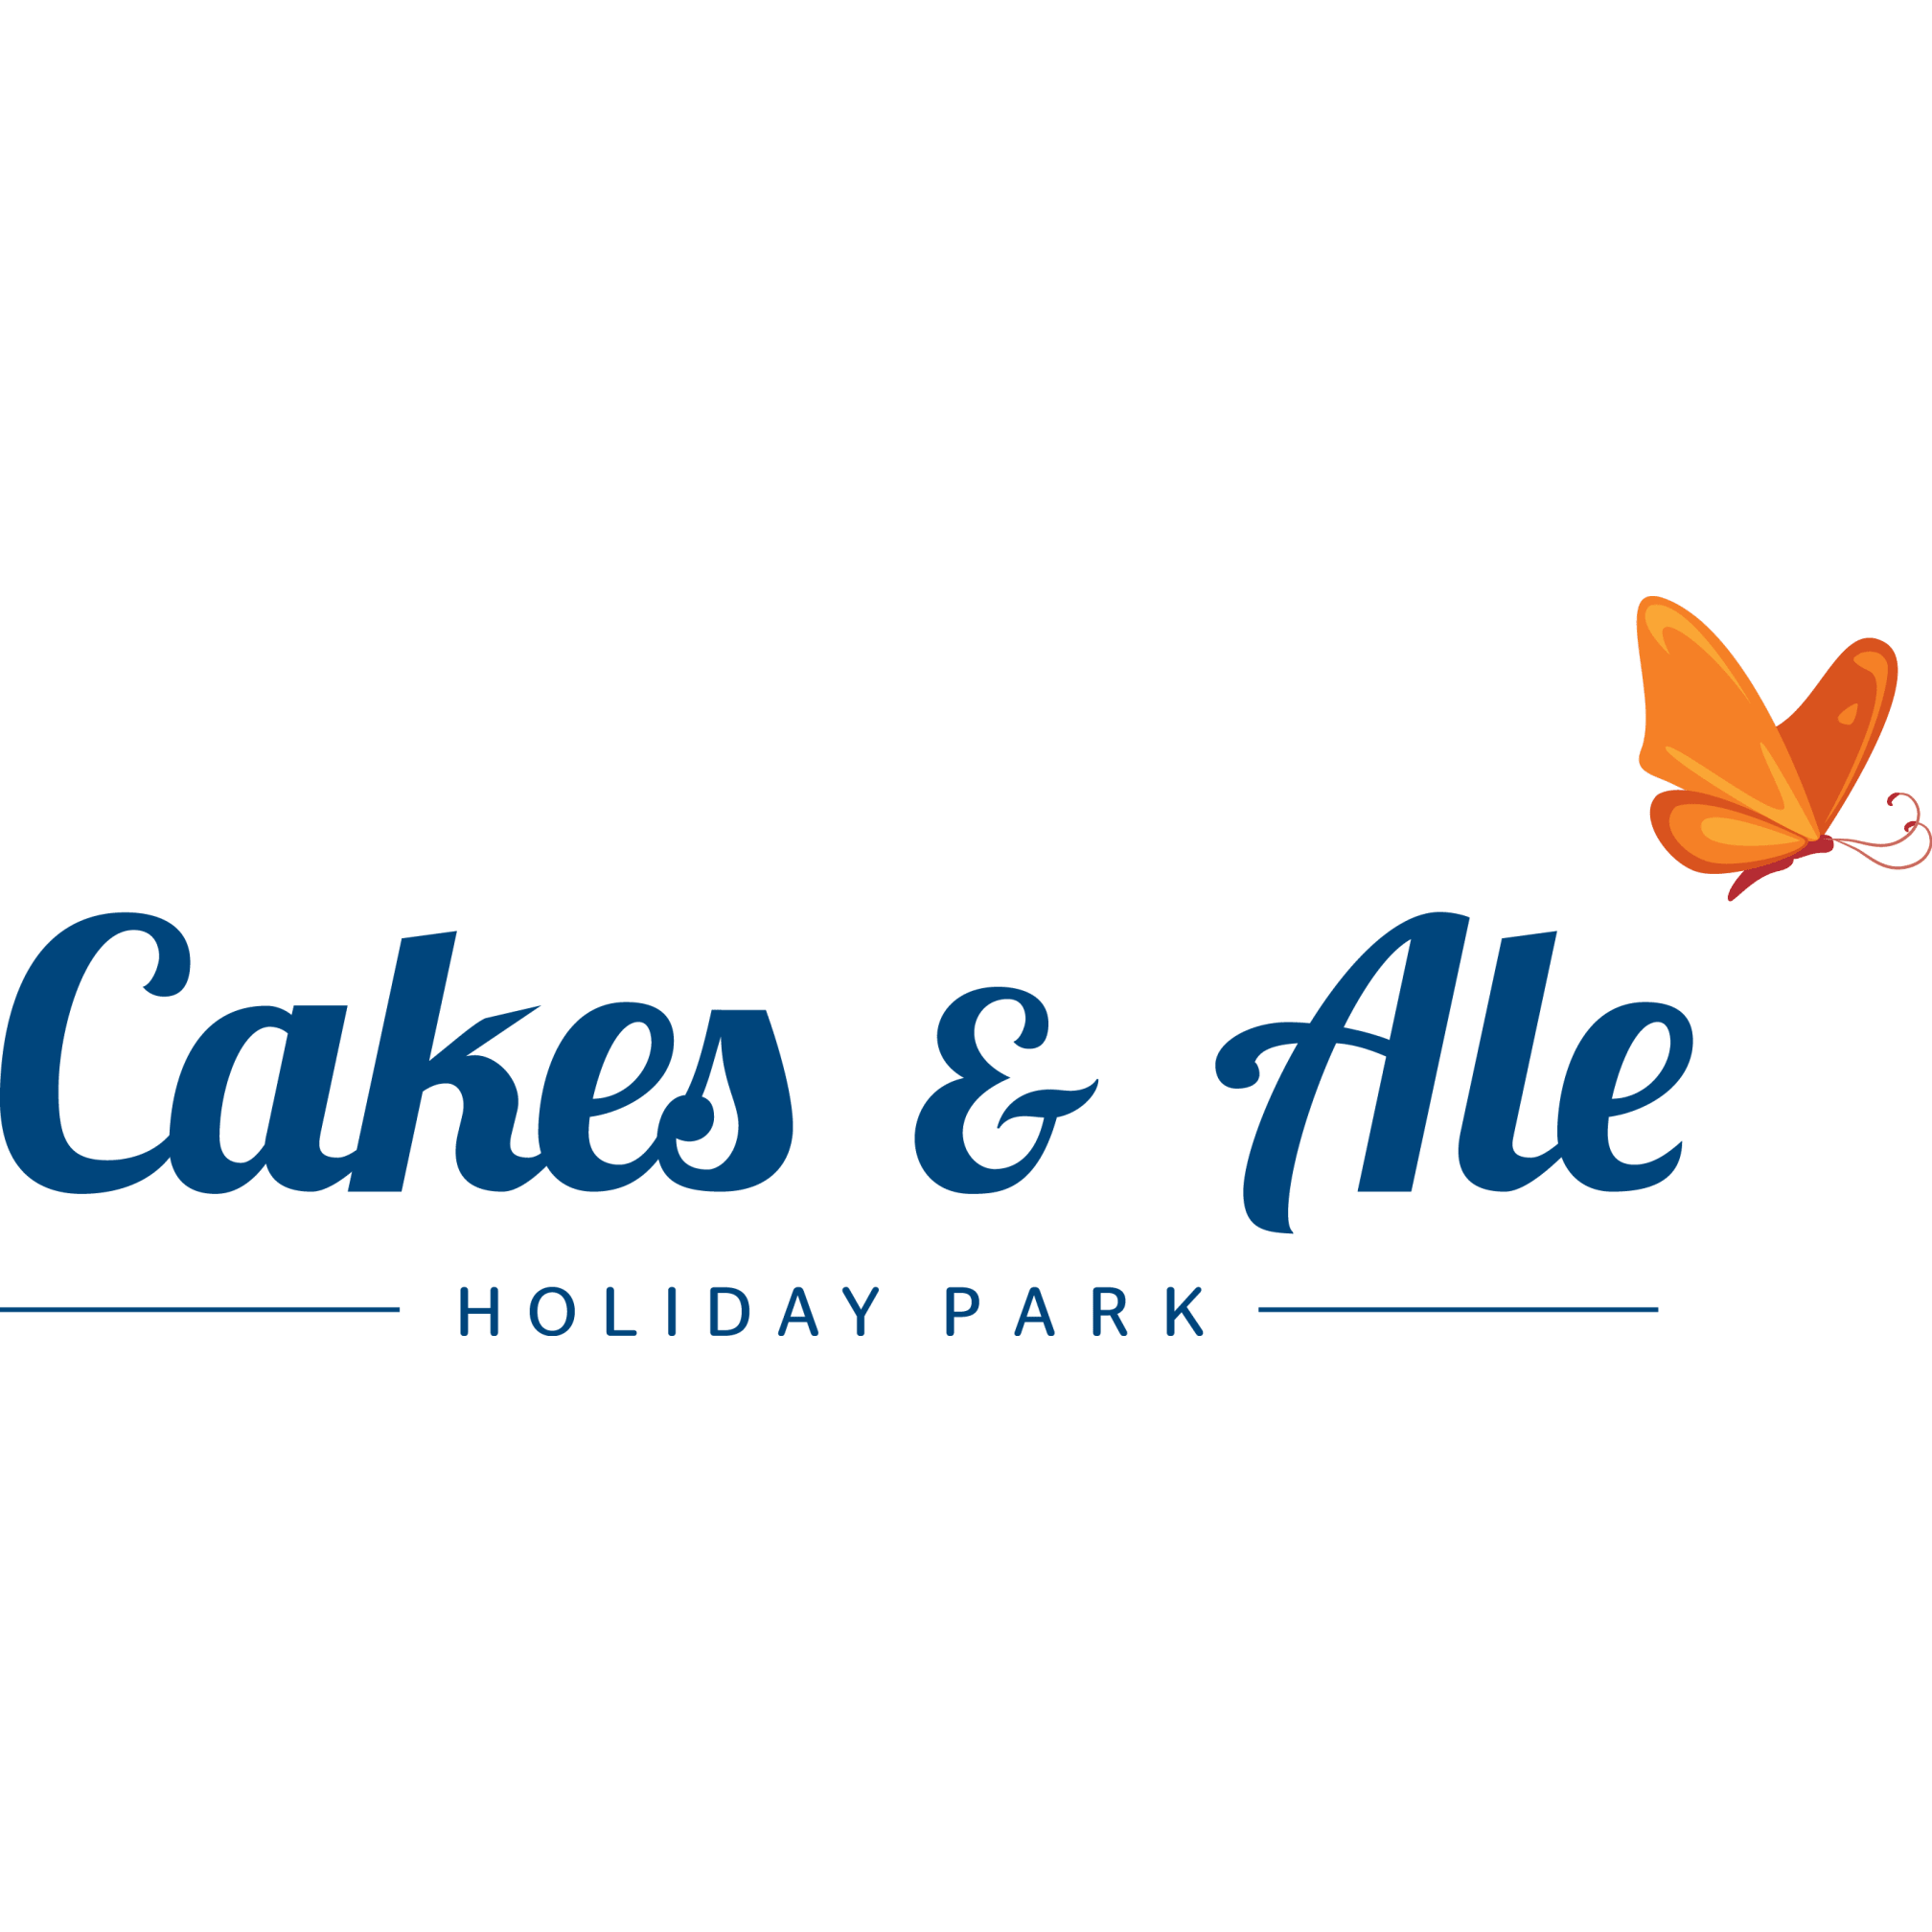 Cakes & Ale Holiday Park - Leiston, Essex IP16 4TE - 01728 831655 | ShowMeLocal.com